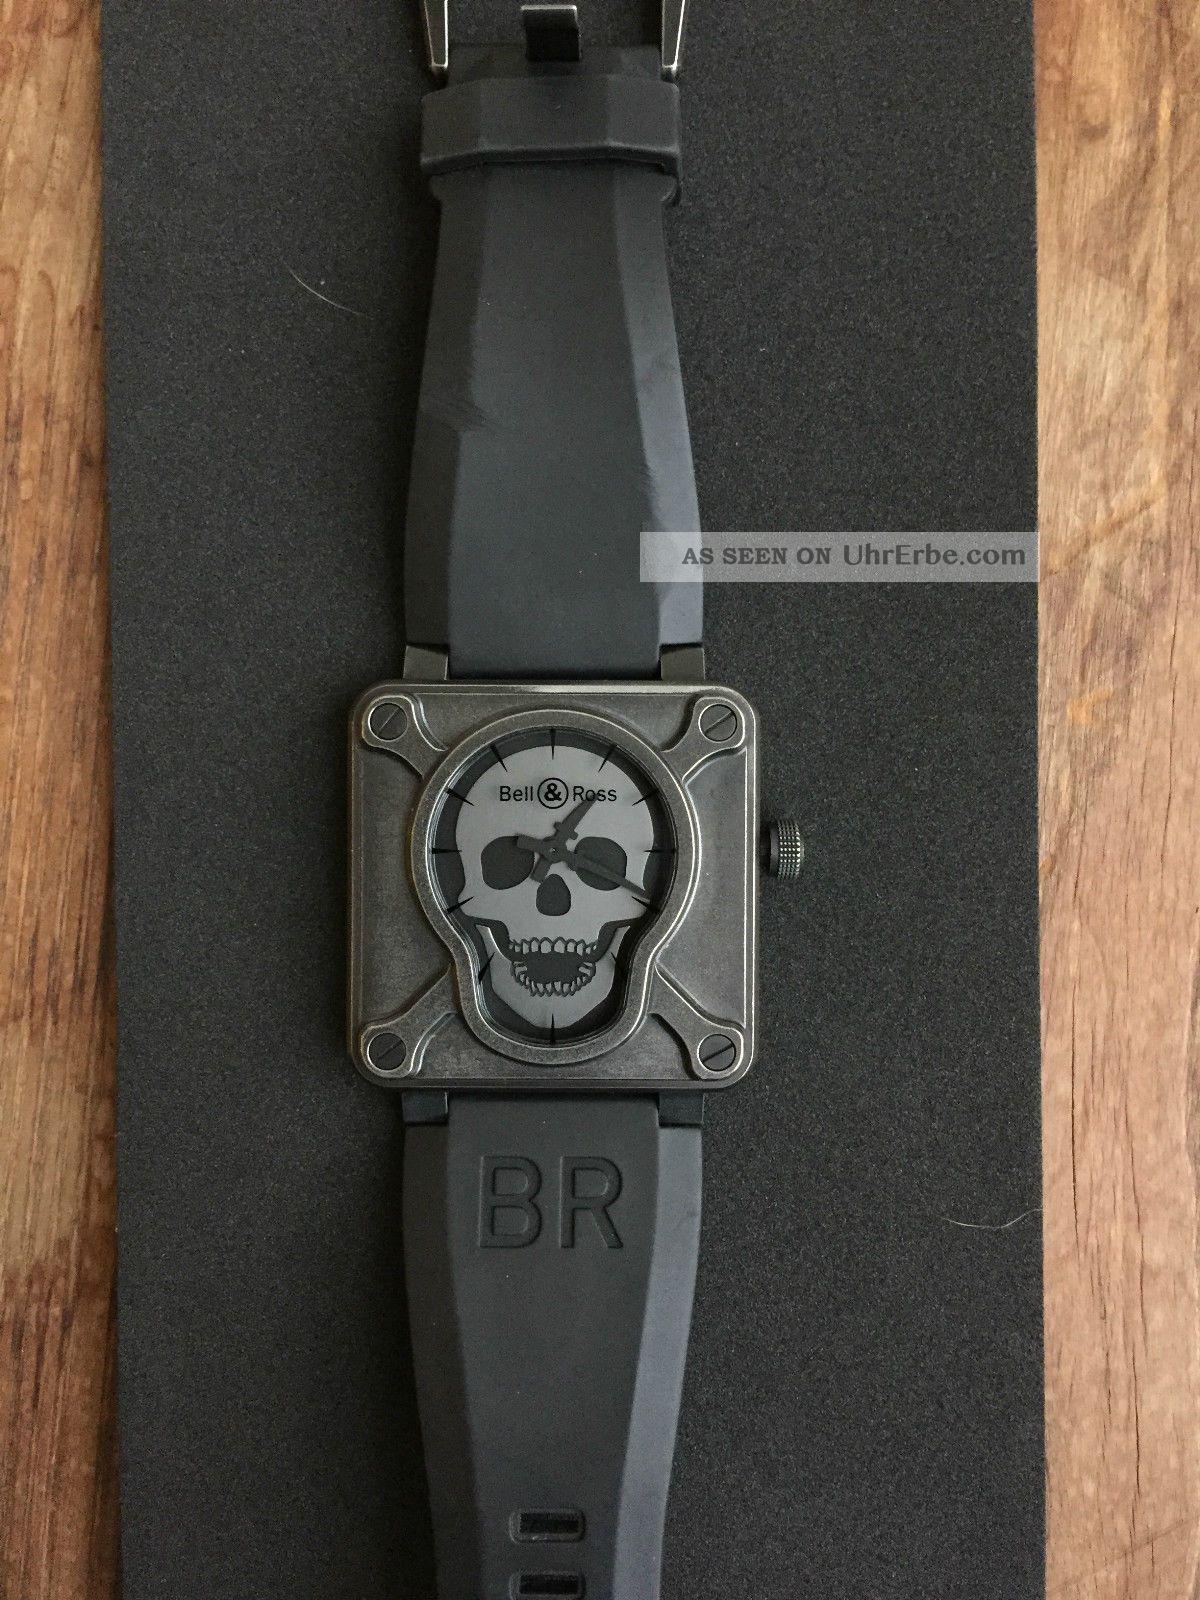 Bell & Ross Aviation Br01 - 92 - S - Airborn Uhr Mit Totenkopf - Limited Edition Armbanduhren Bild